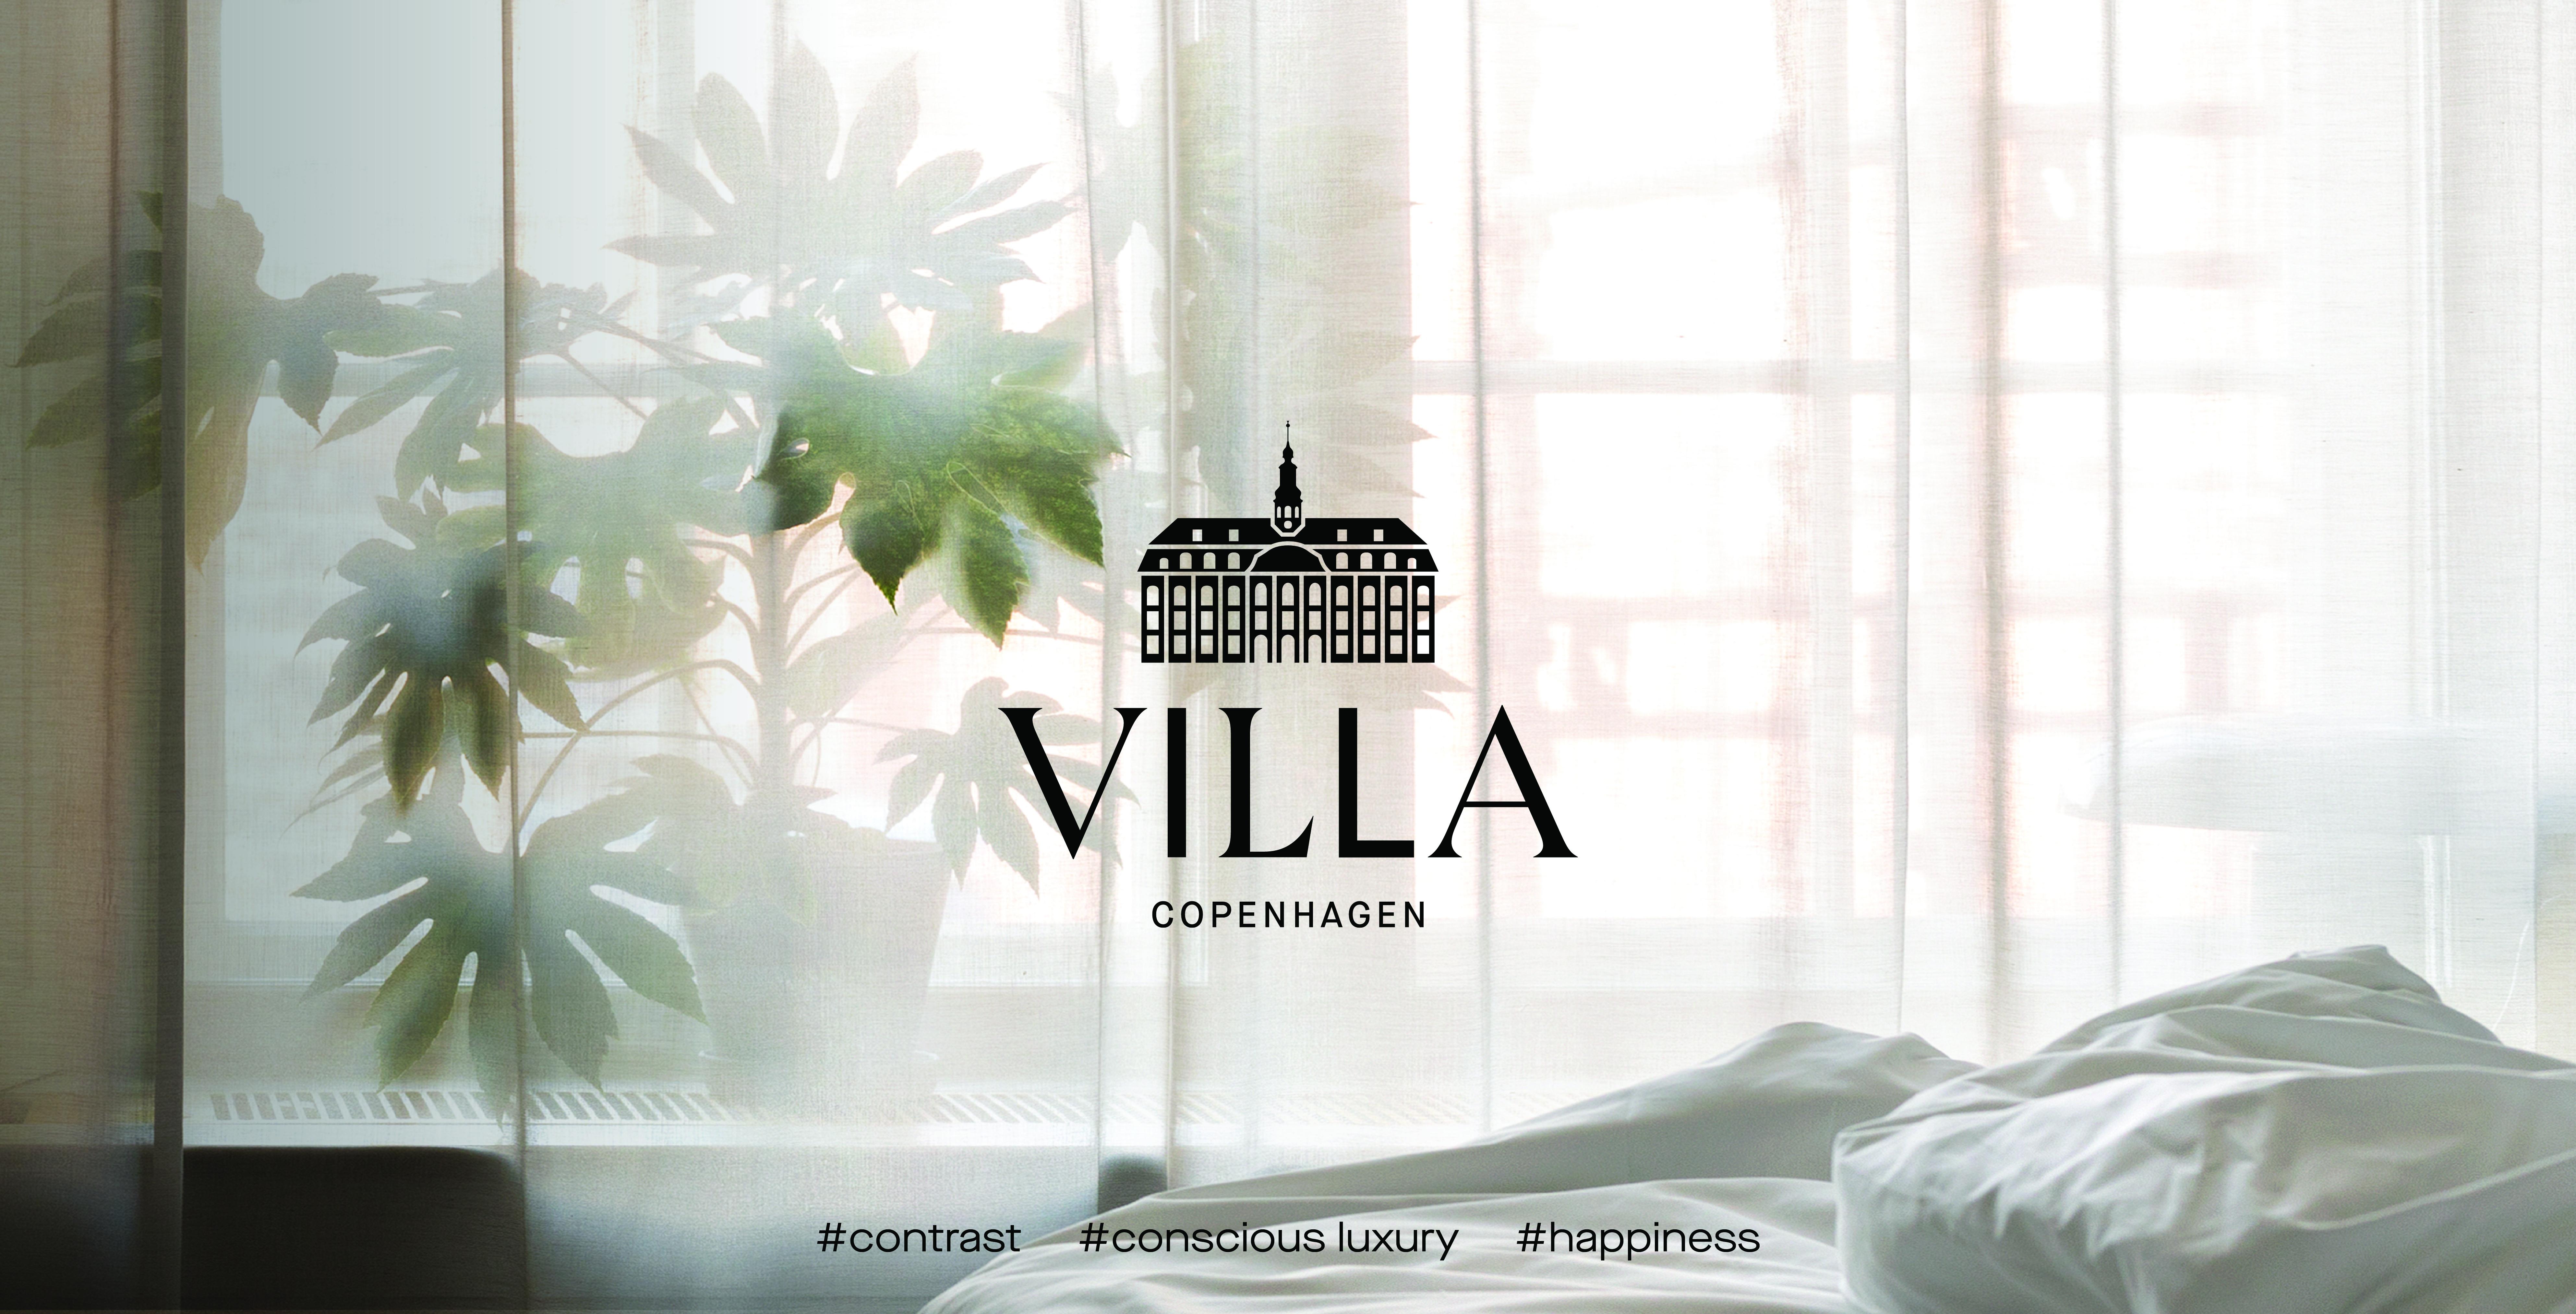 villa-header-image_window